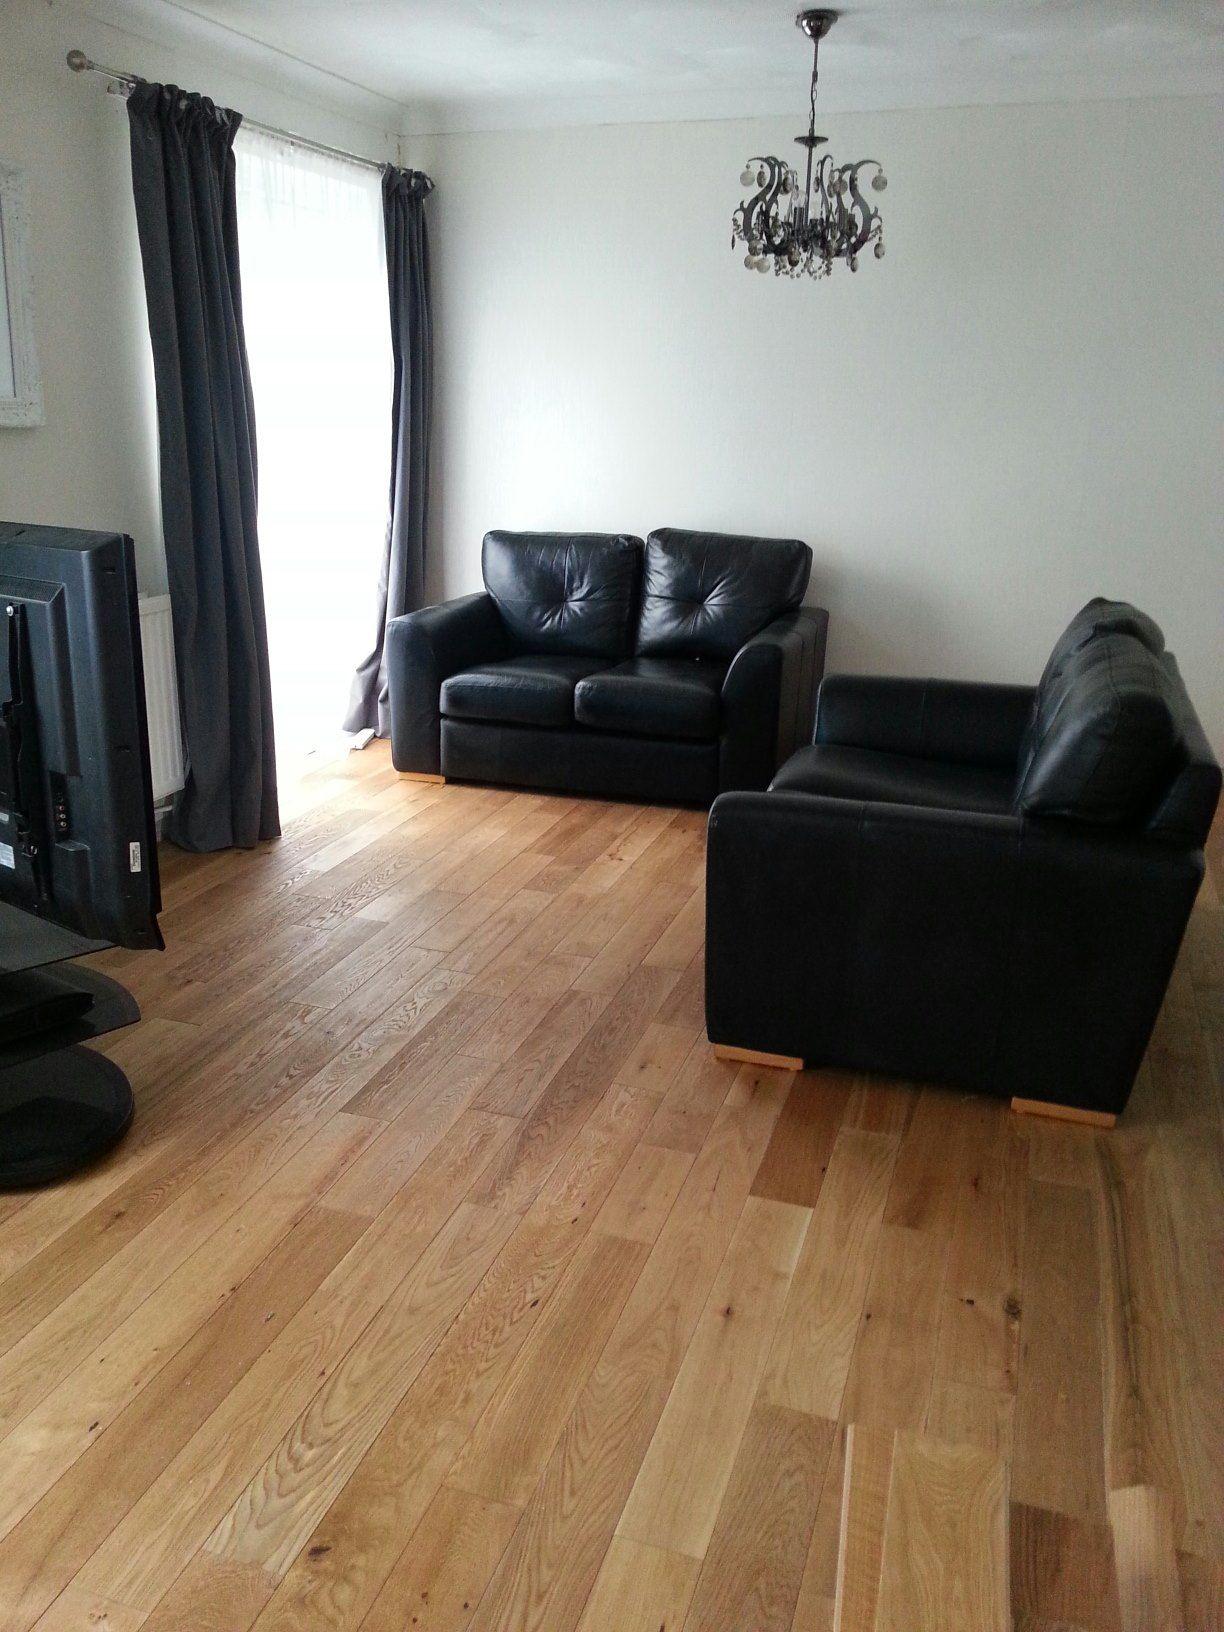 Engineered vs laminate flooring woodandbeyond wood - Laminate flooring vs hardwood flooring ...